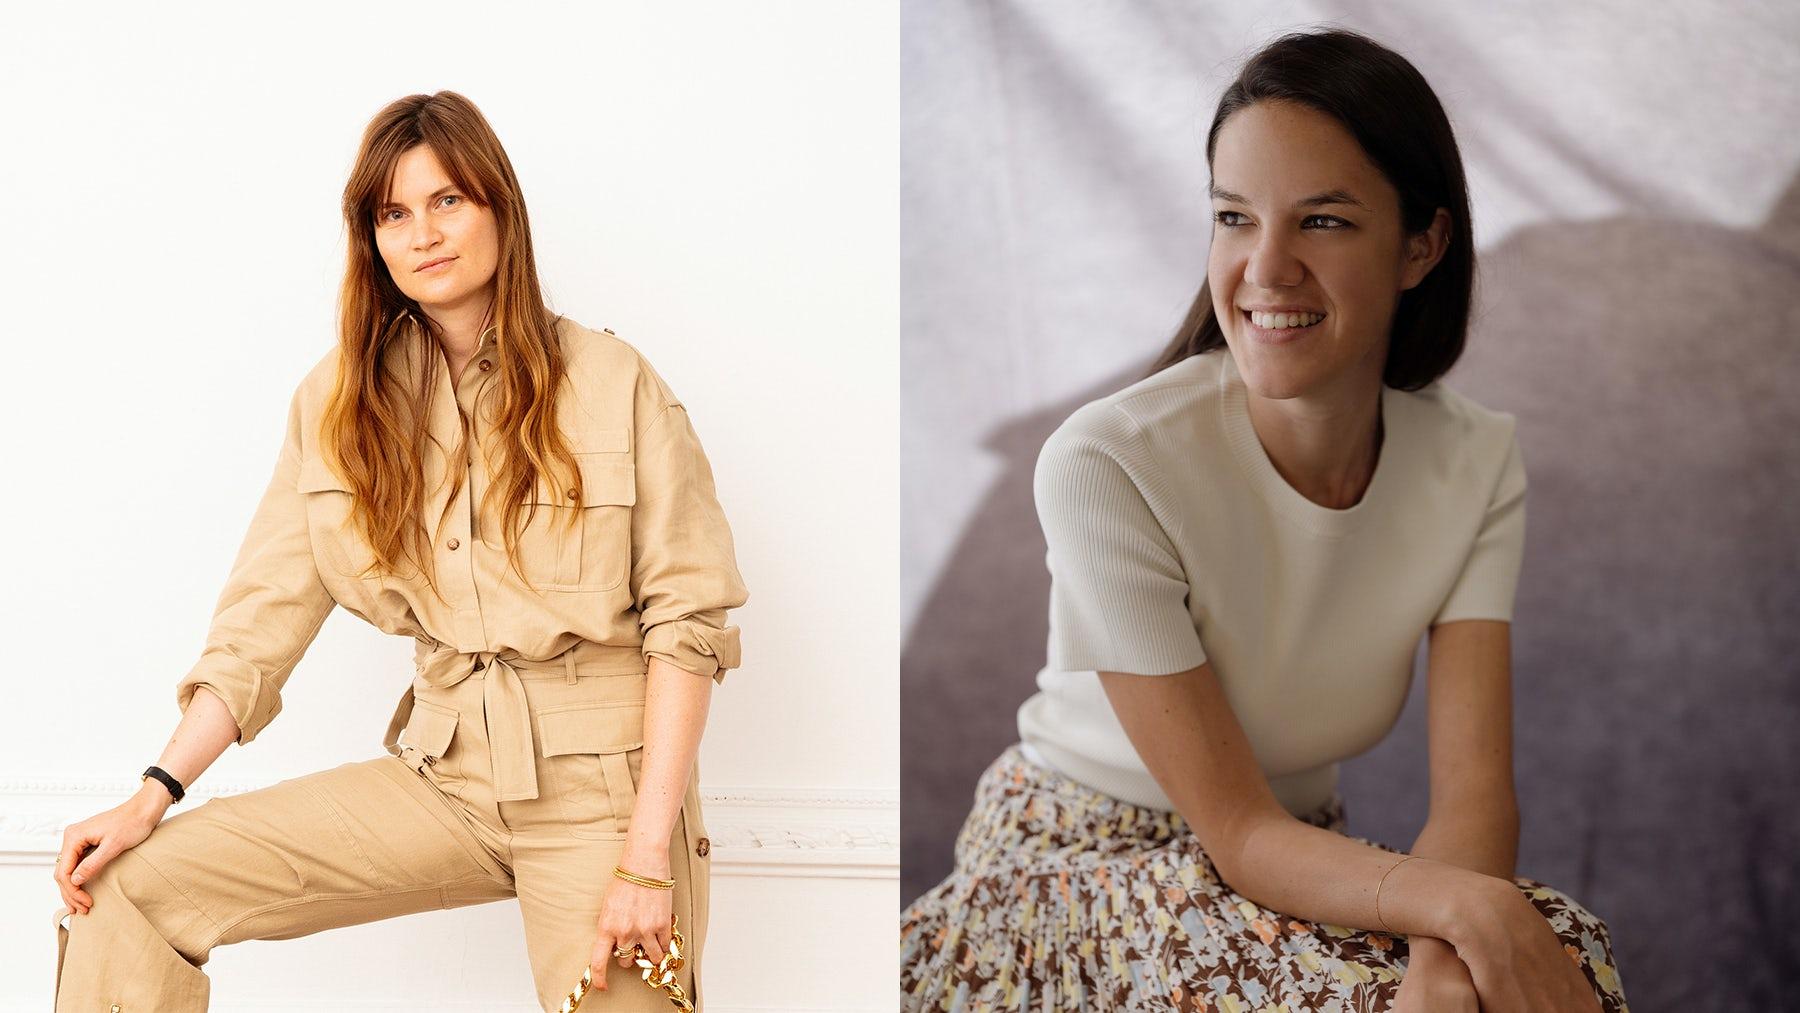 Eugénie Trochu, Vogue Paris\' new head of editorial content (left). Adeline Mai. Francesca Ragazzi, Vogue Italia head of editorial content (right). Courtesy.